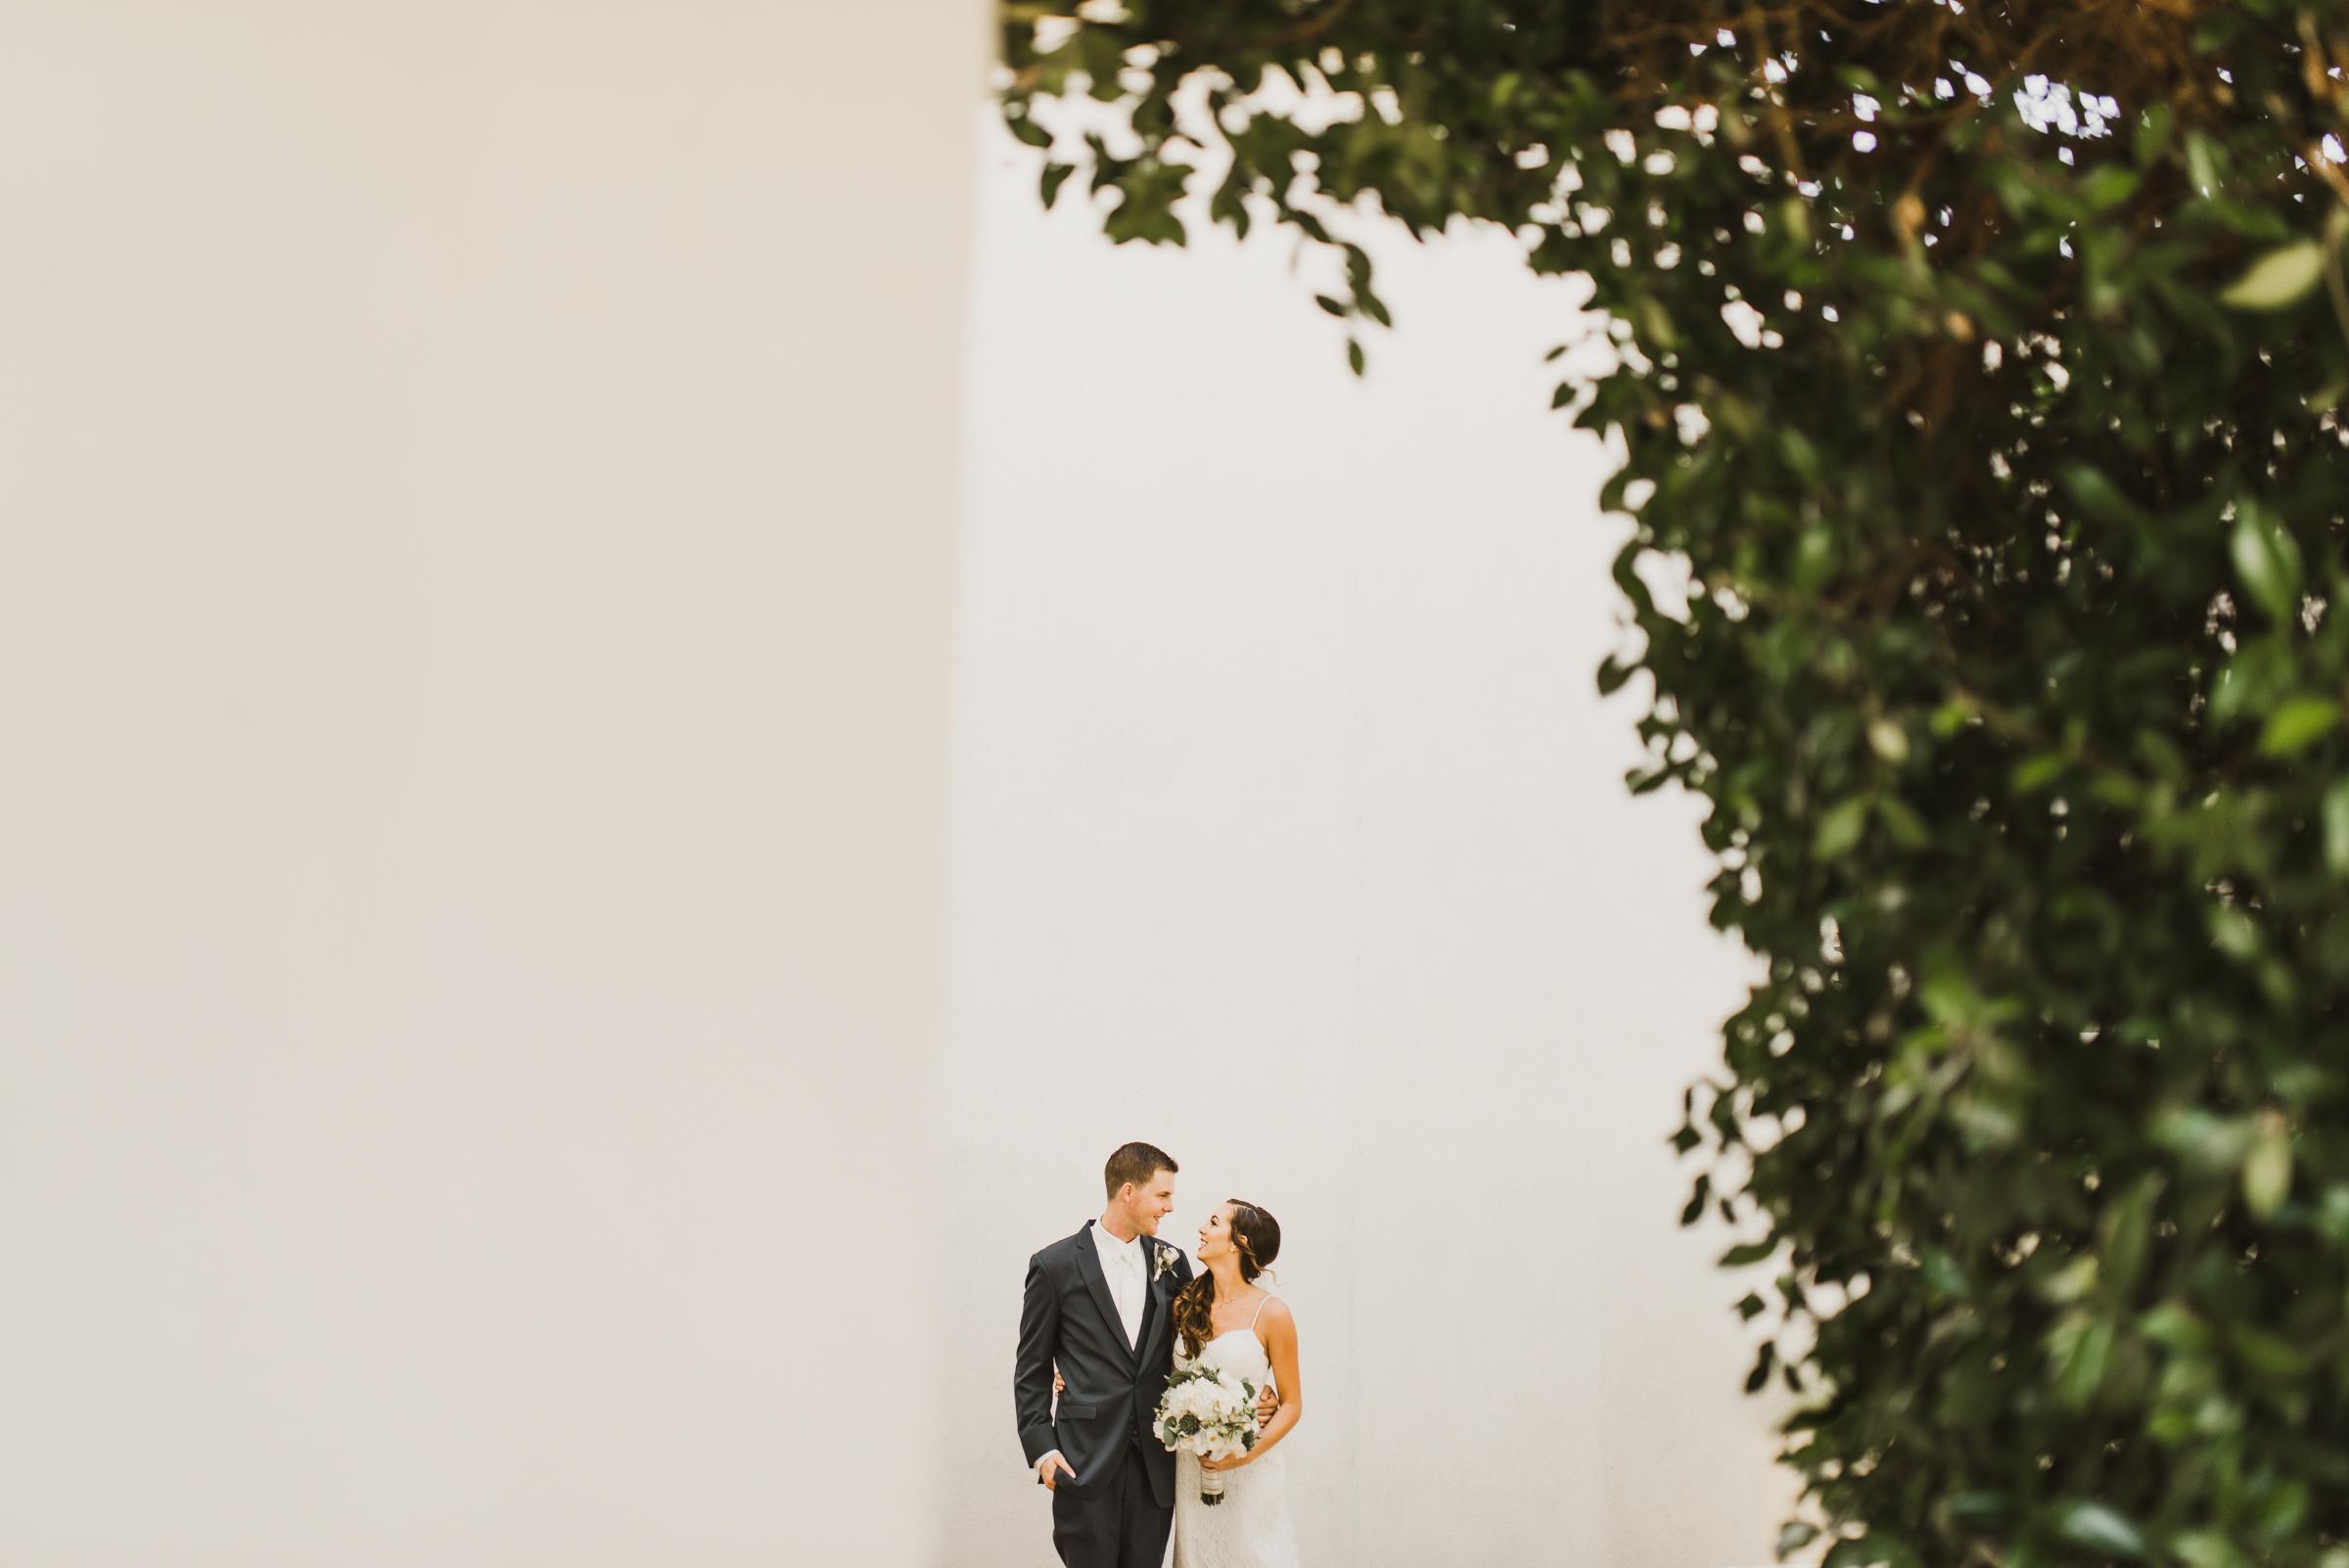 ©Isaiah + Taylor Photography - Rosarito Beach Destination Wedding, Mexico-0041.jpg